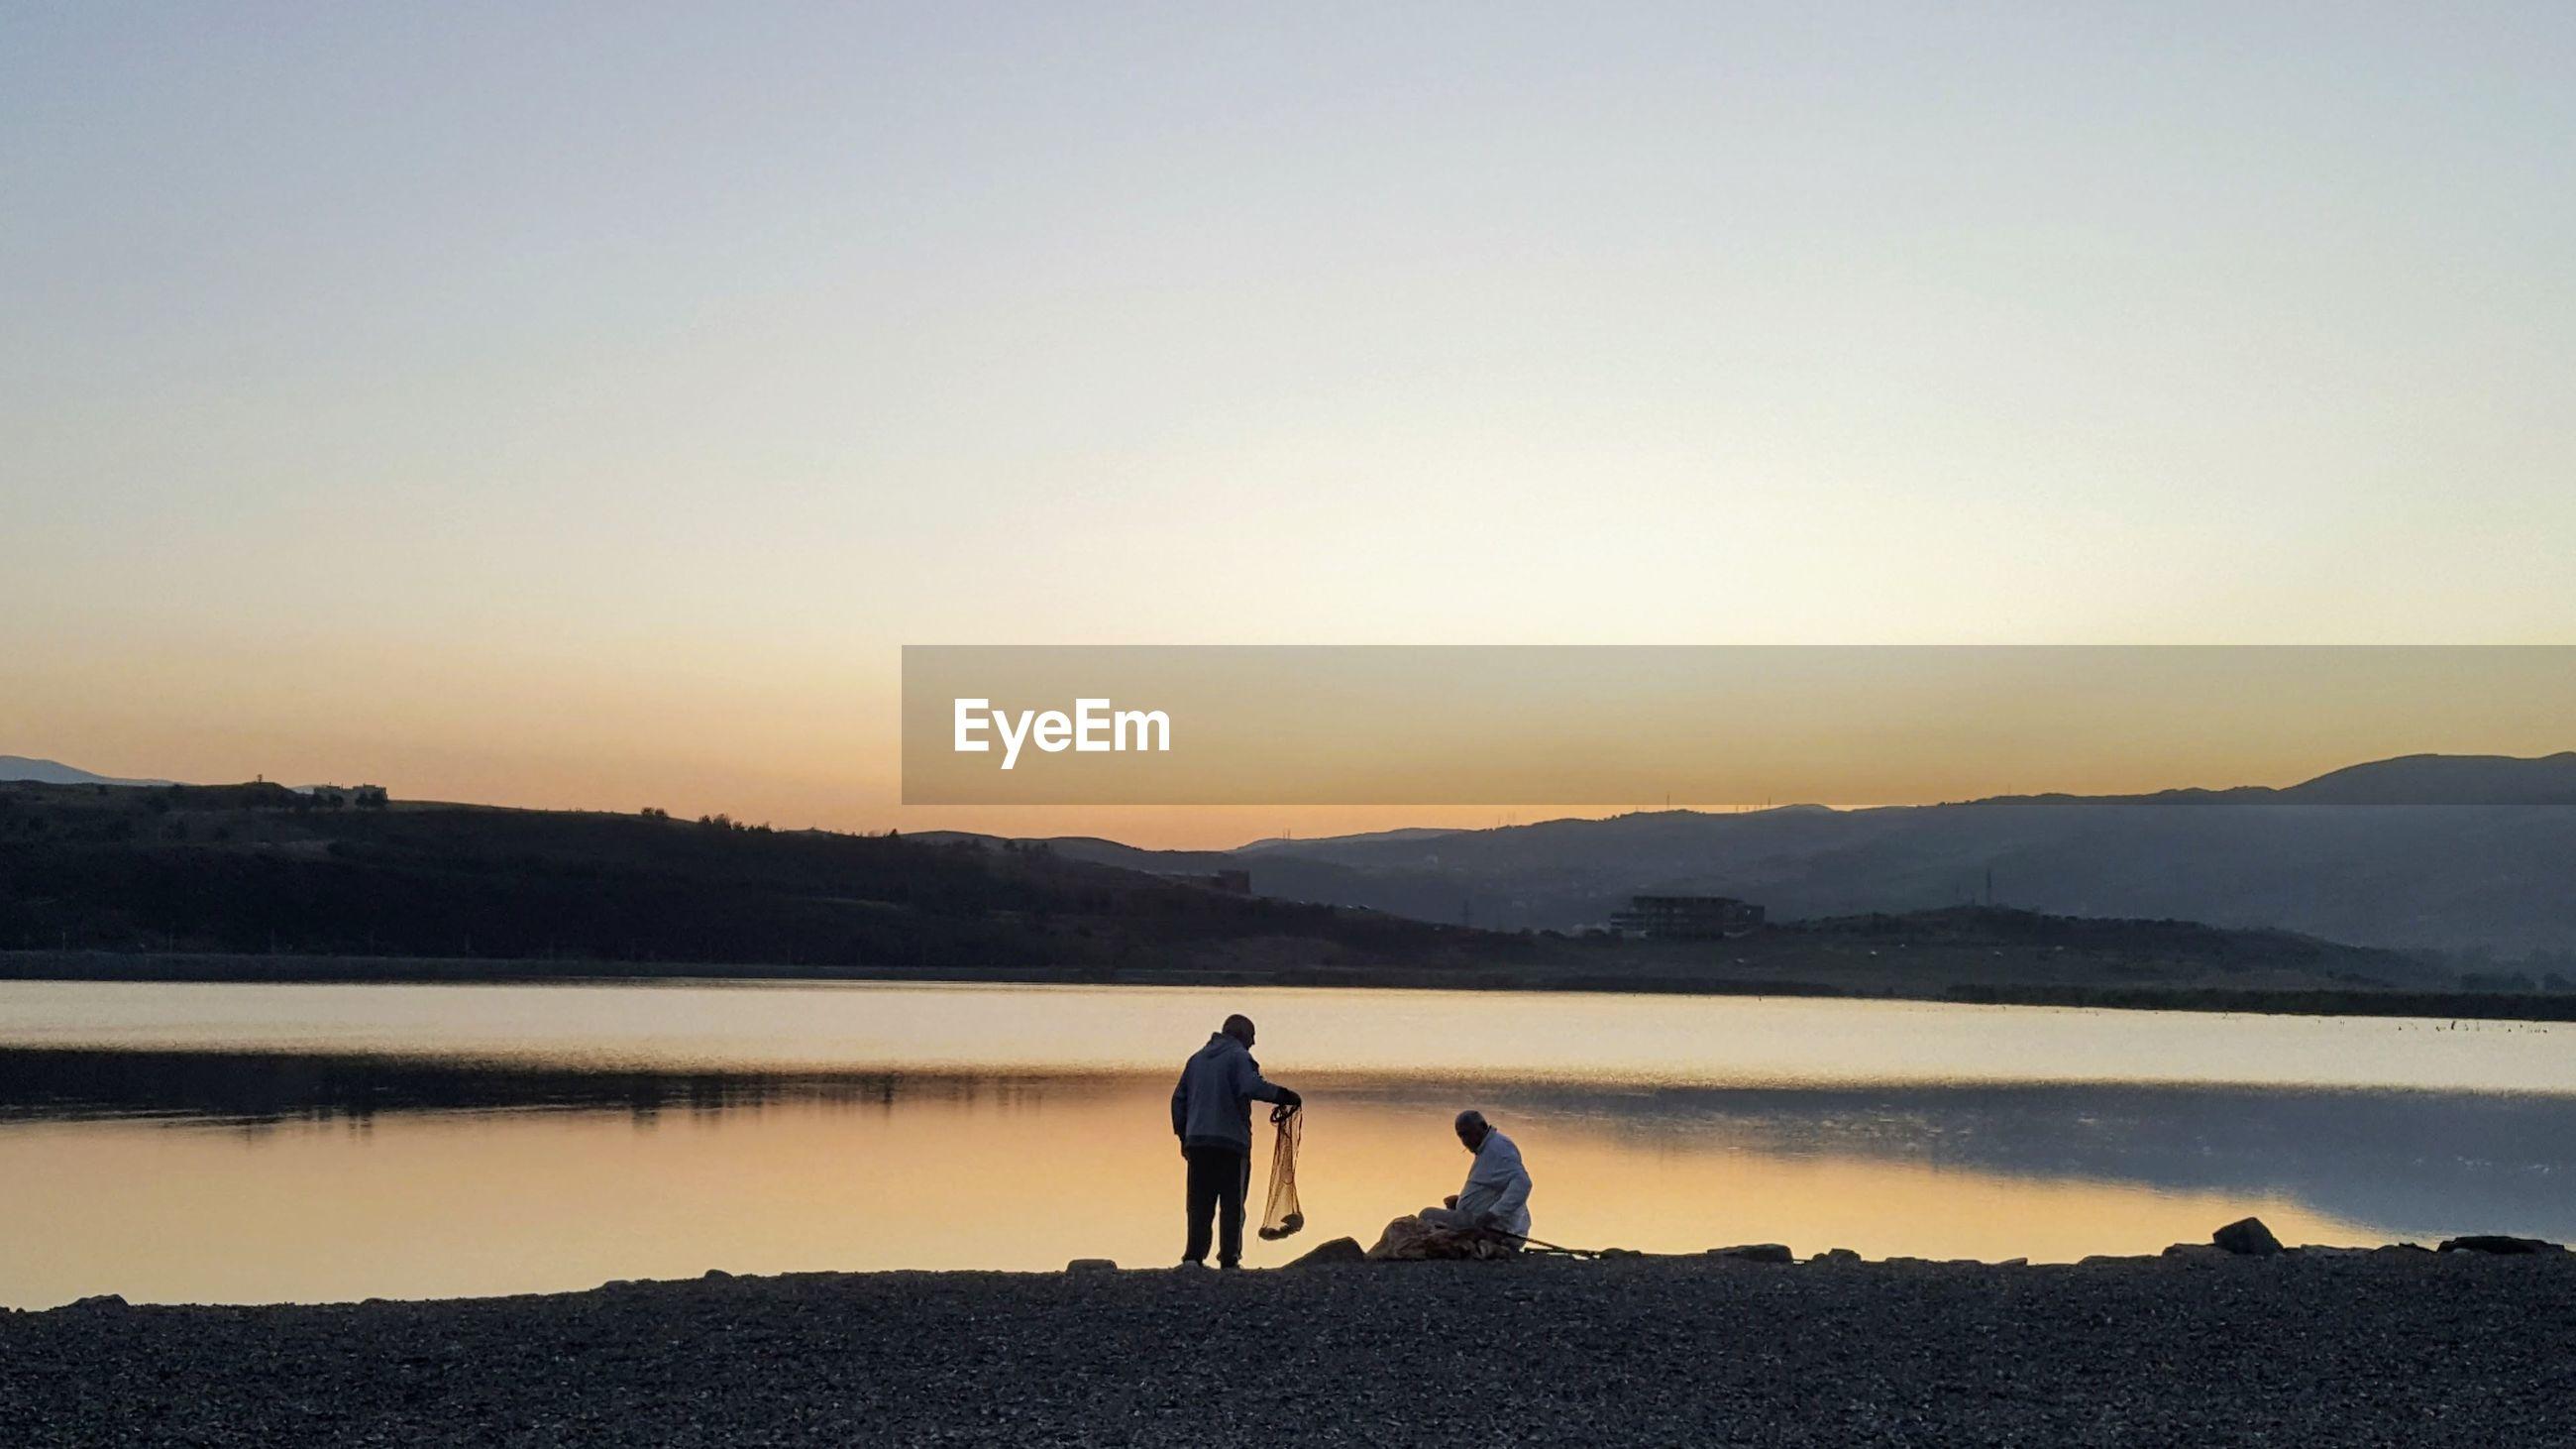 Men fishing in lake against sky during sunset